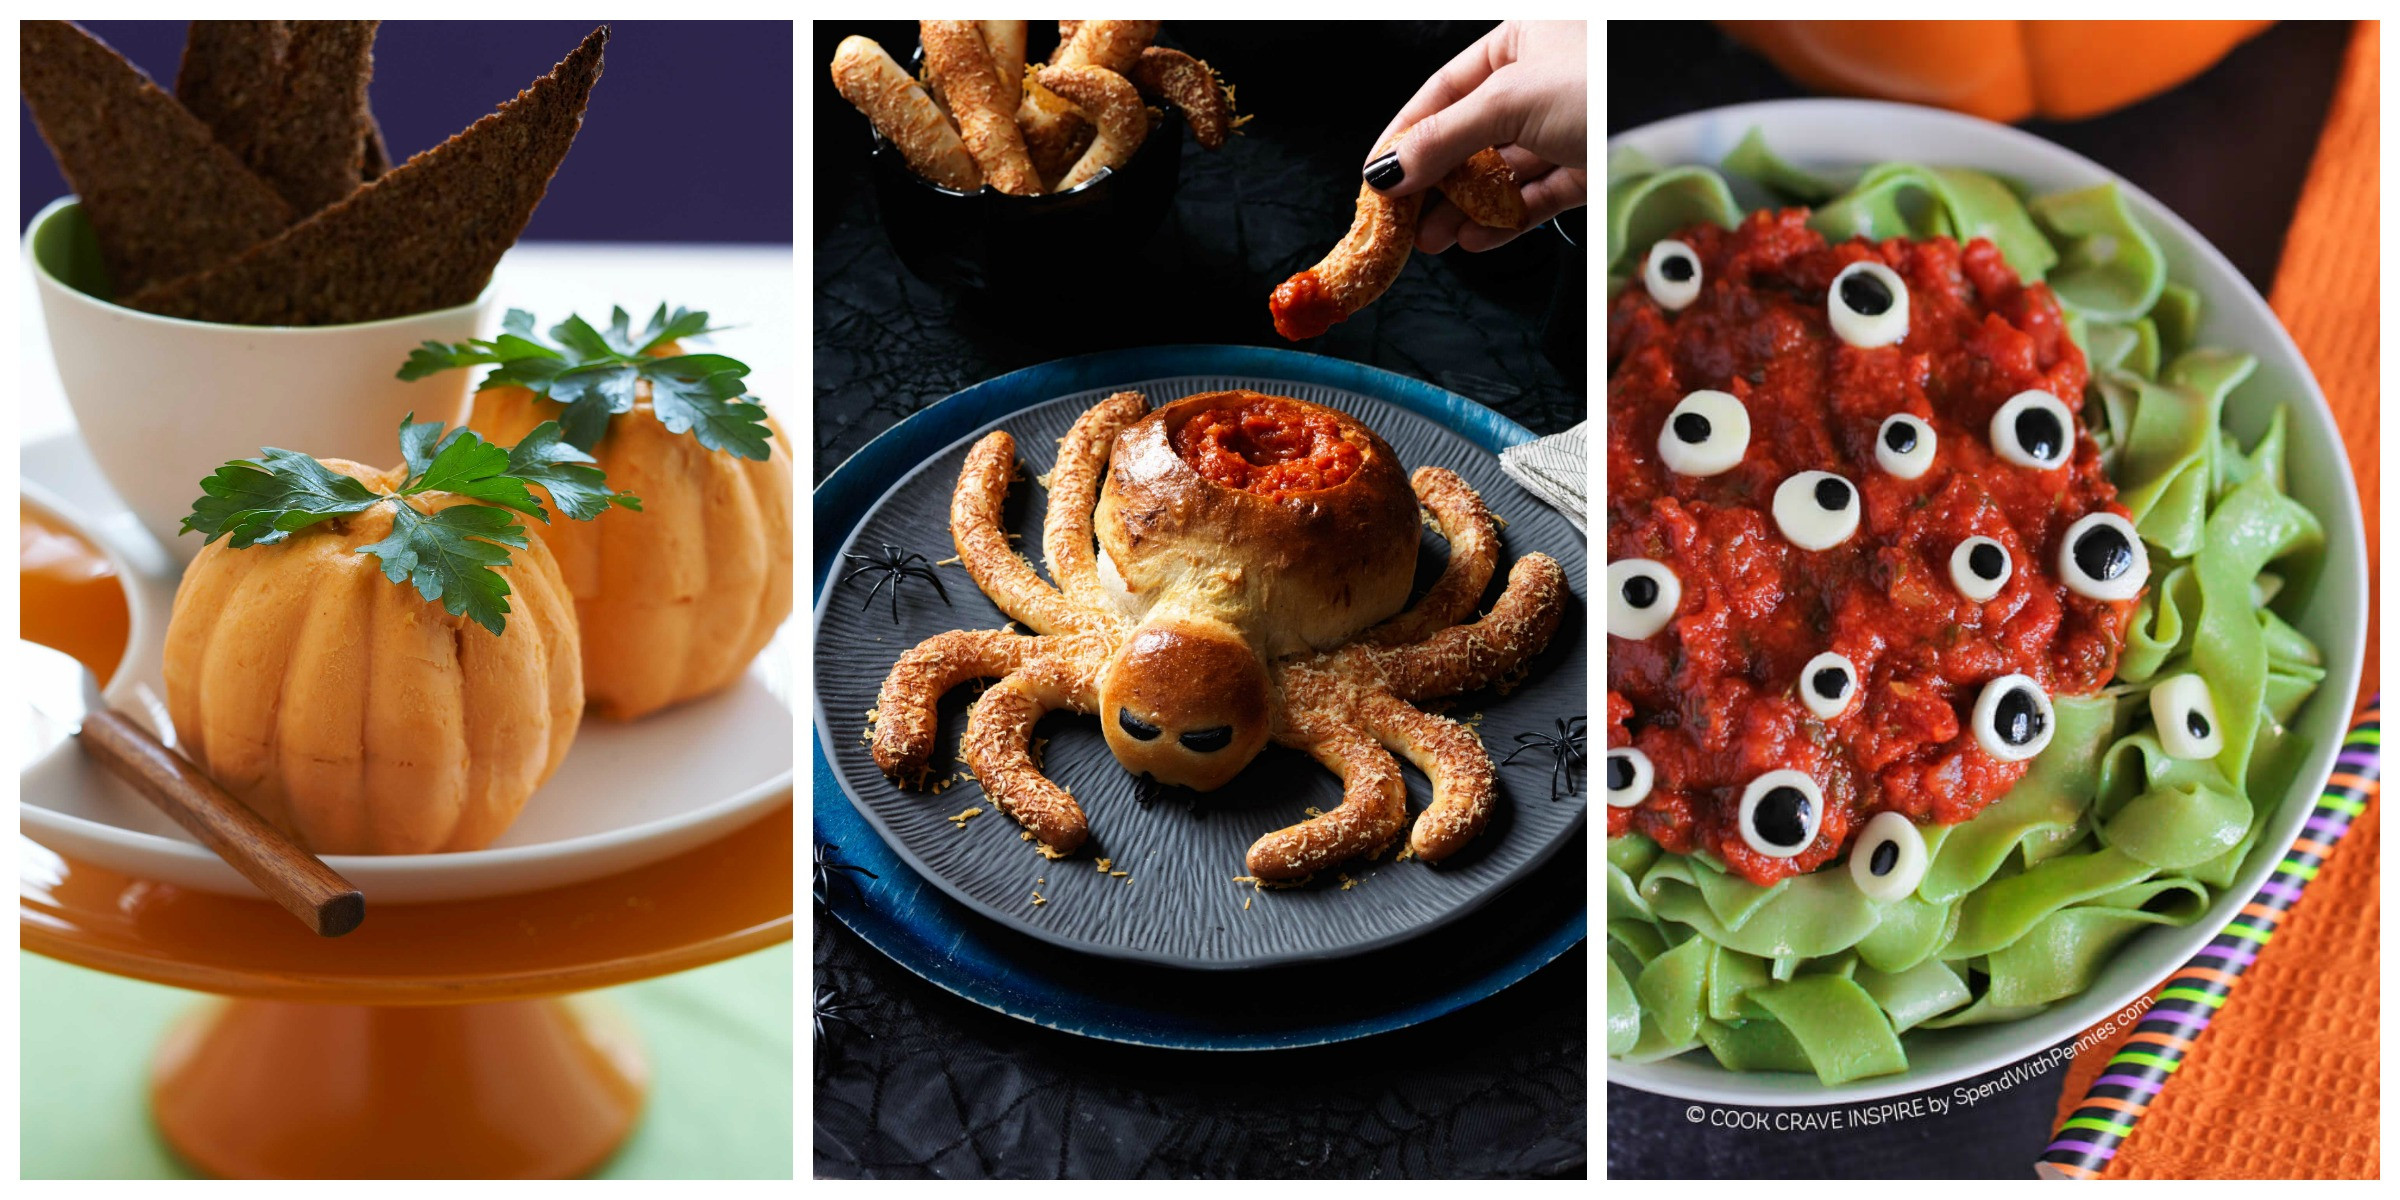 Fun Halloween Dinners  25 Spooky Halloween Dinner Ideas Best Recipes for